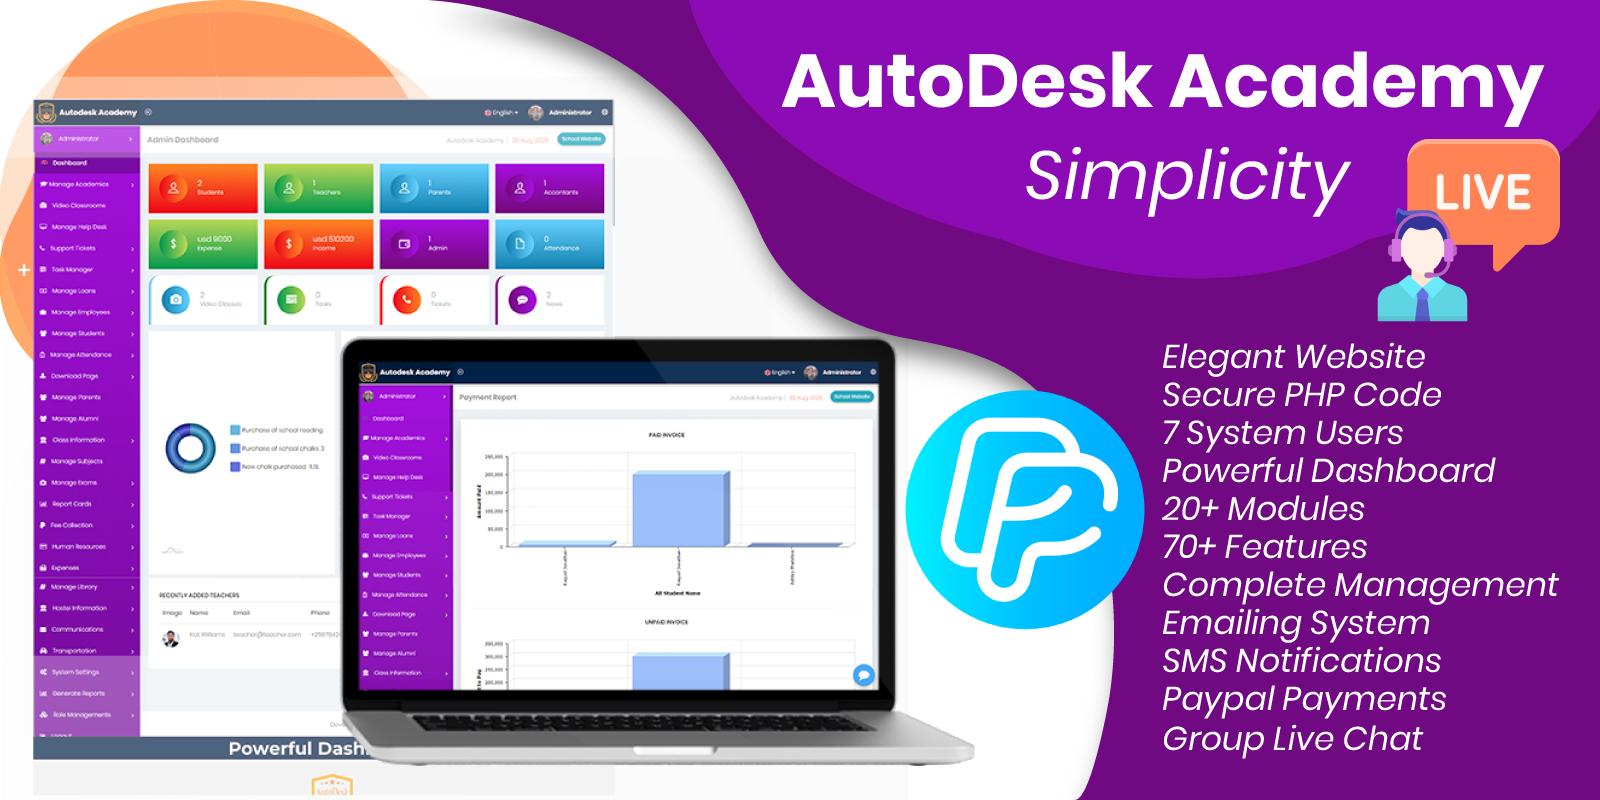 Autodesk Academy Erp System